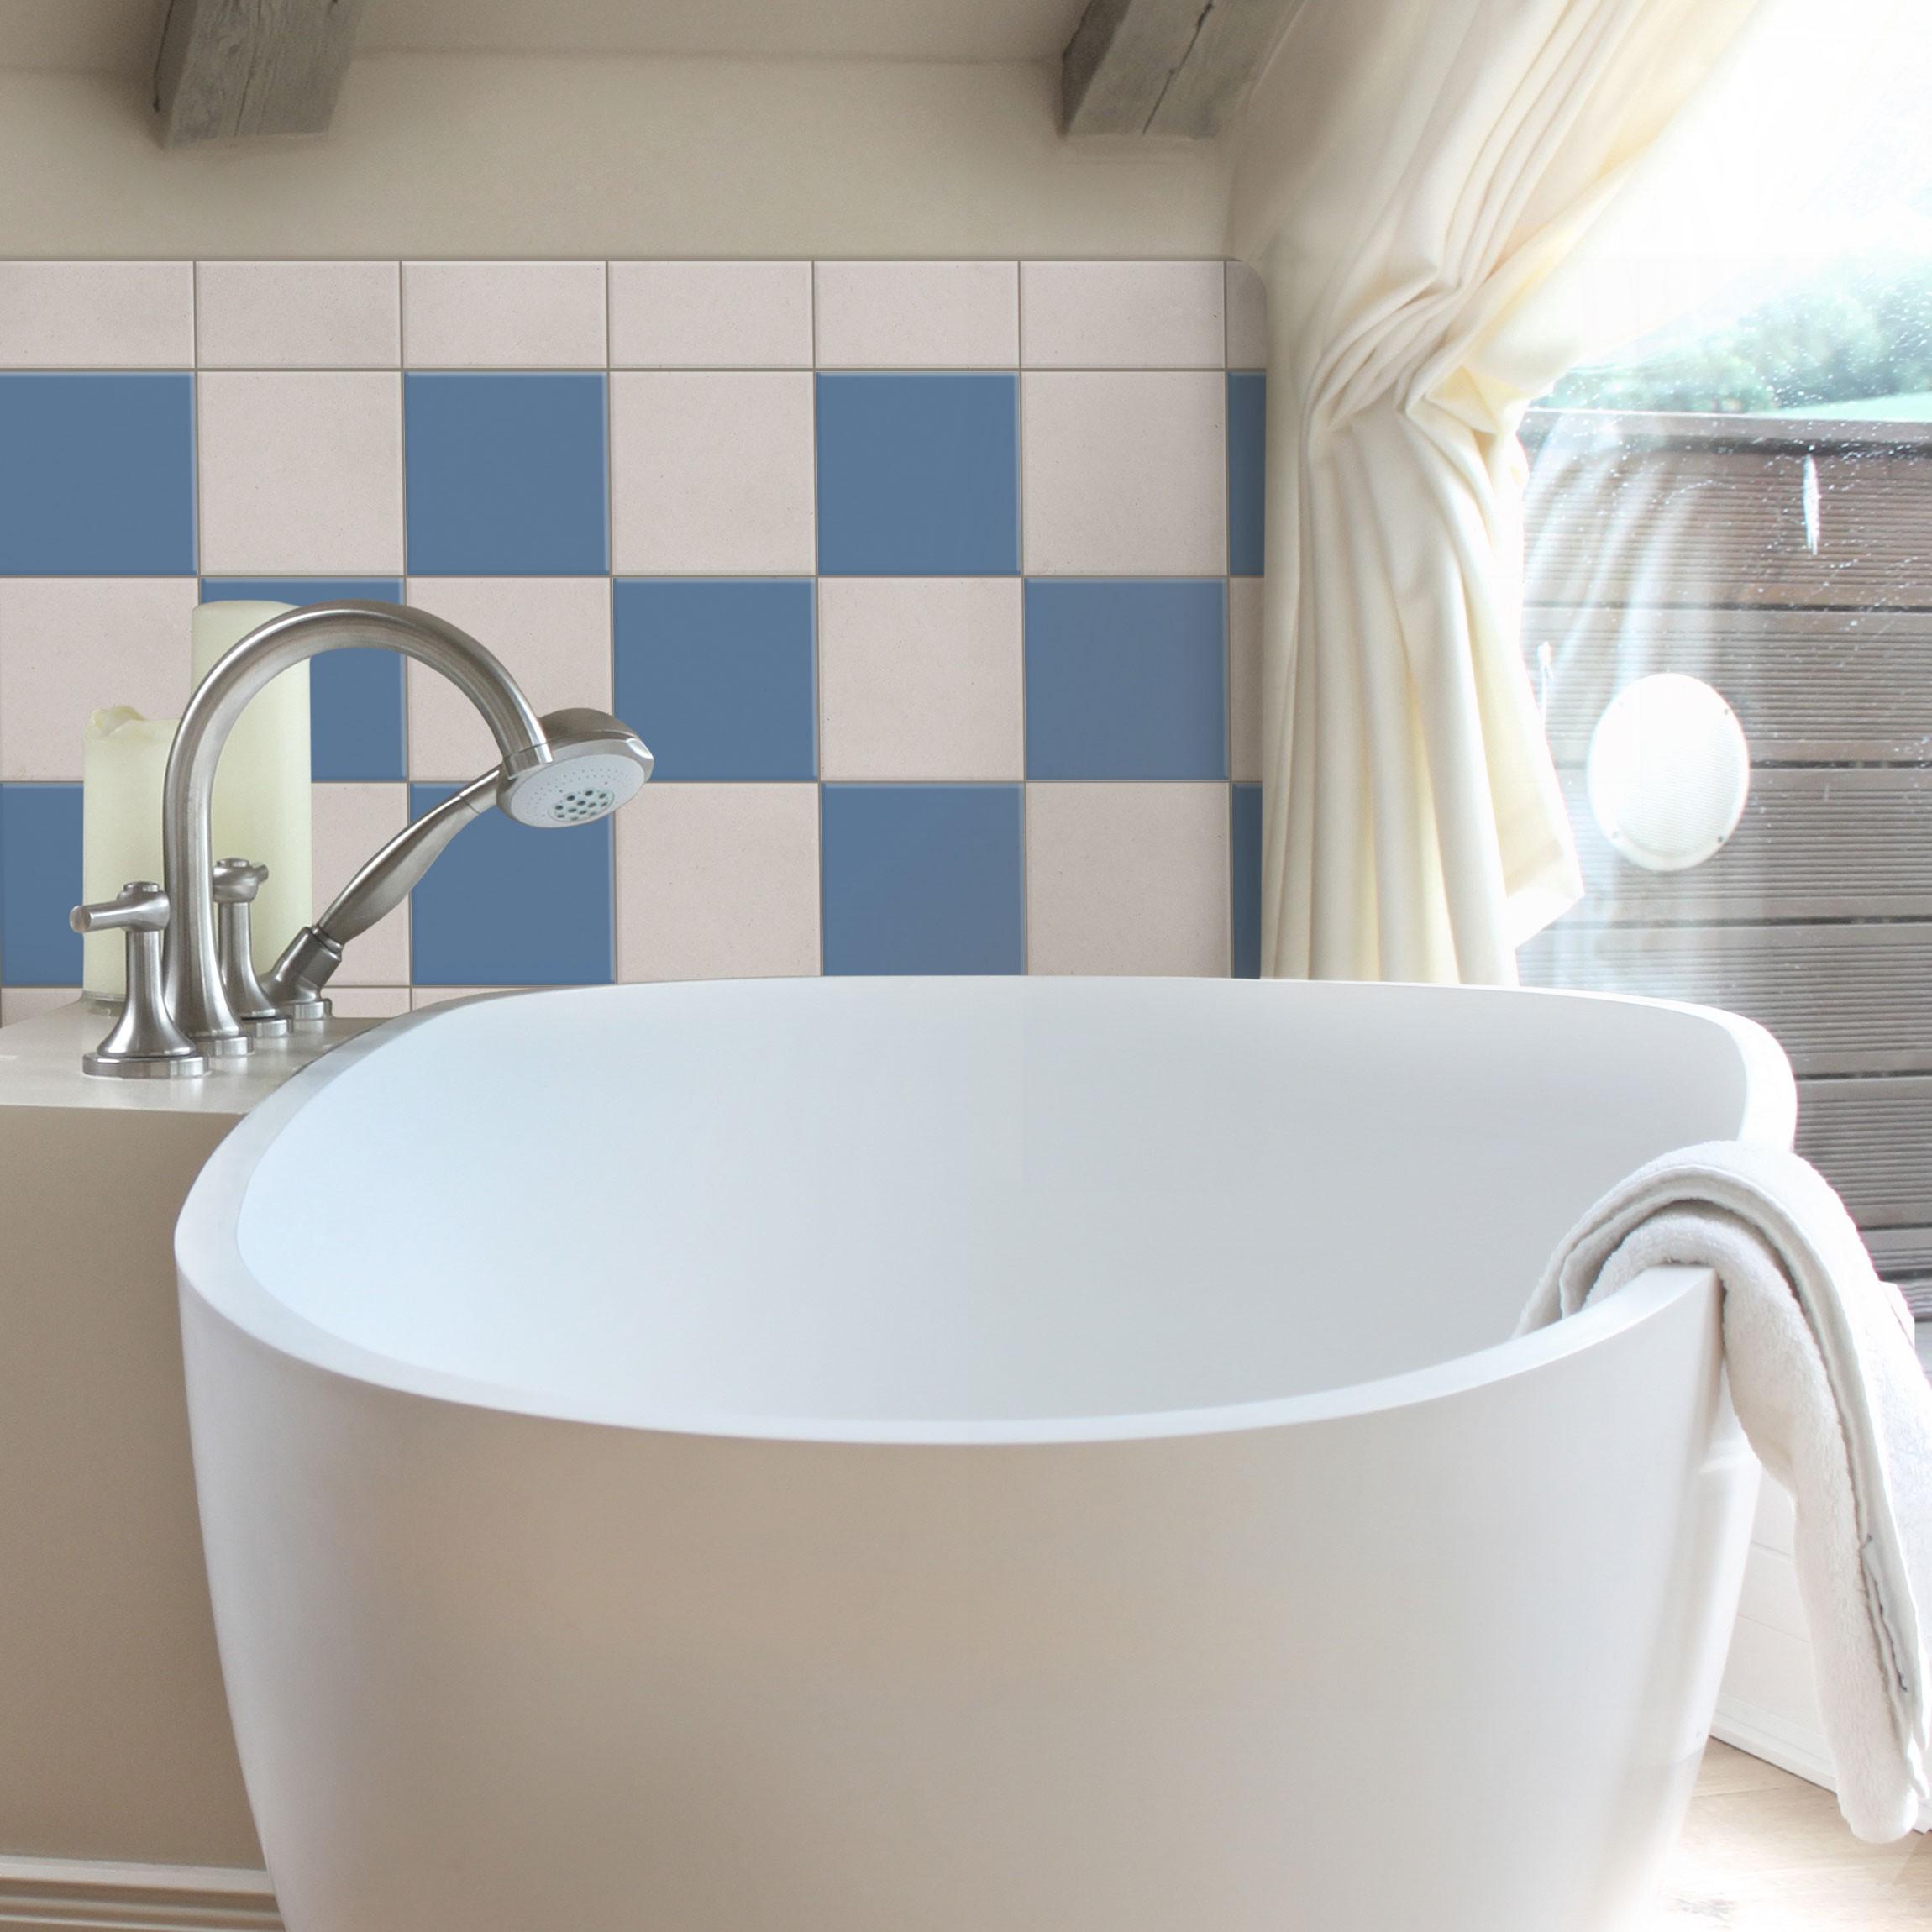 fliesenaufkleber bad k che colour royal blue 15x15 cm set blau. Black Bedroom Furniture Sets. Home Design Ideas